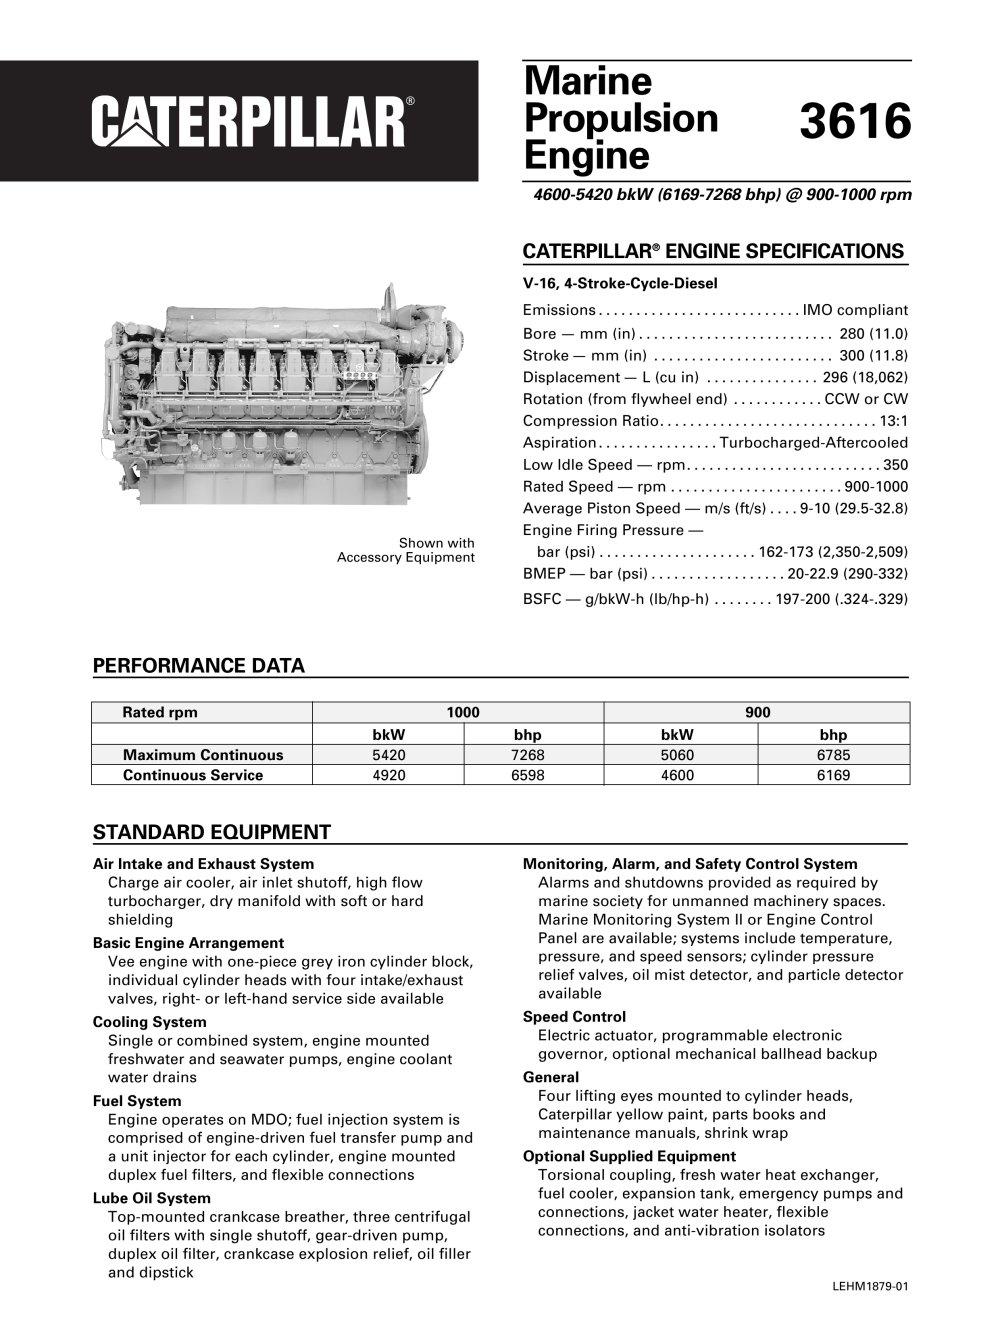 Cat 3616 Propulsion Spec Sheets - 1 / 2 Pages